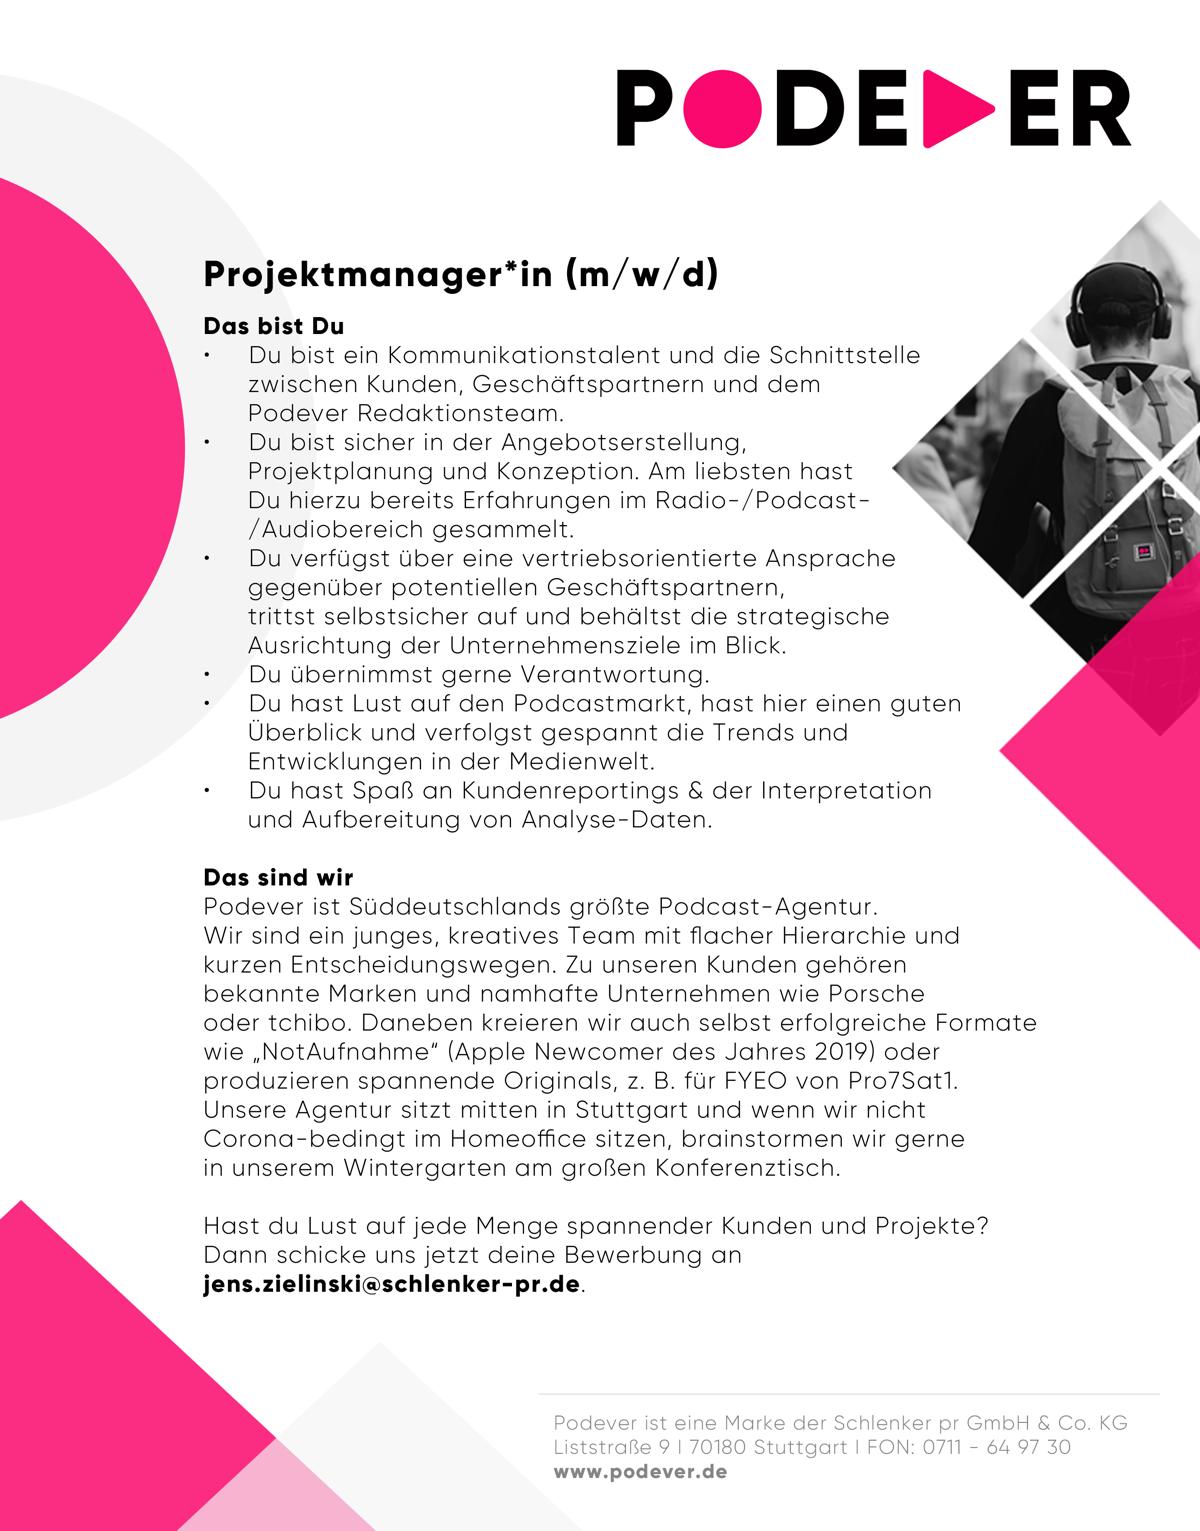 PODEVER sucht Projektmanager (m/w/d)